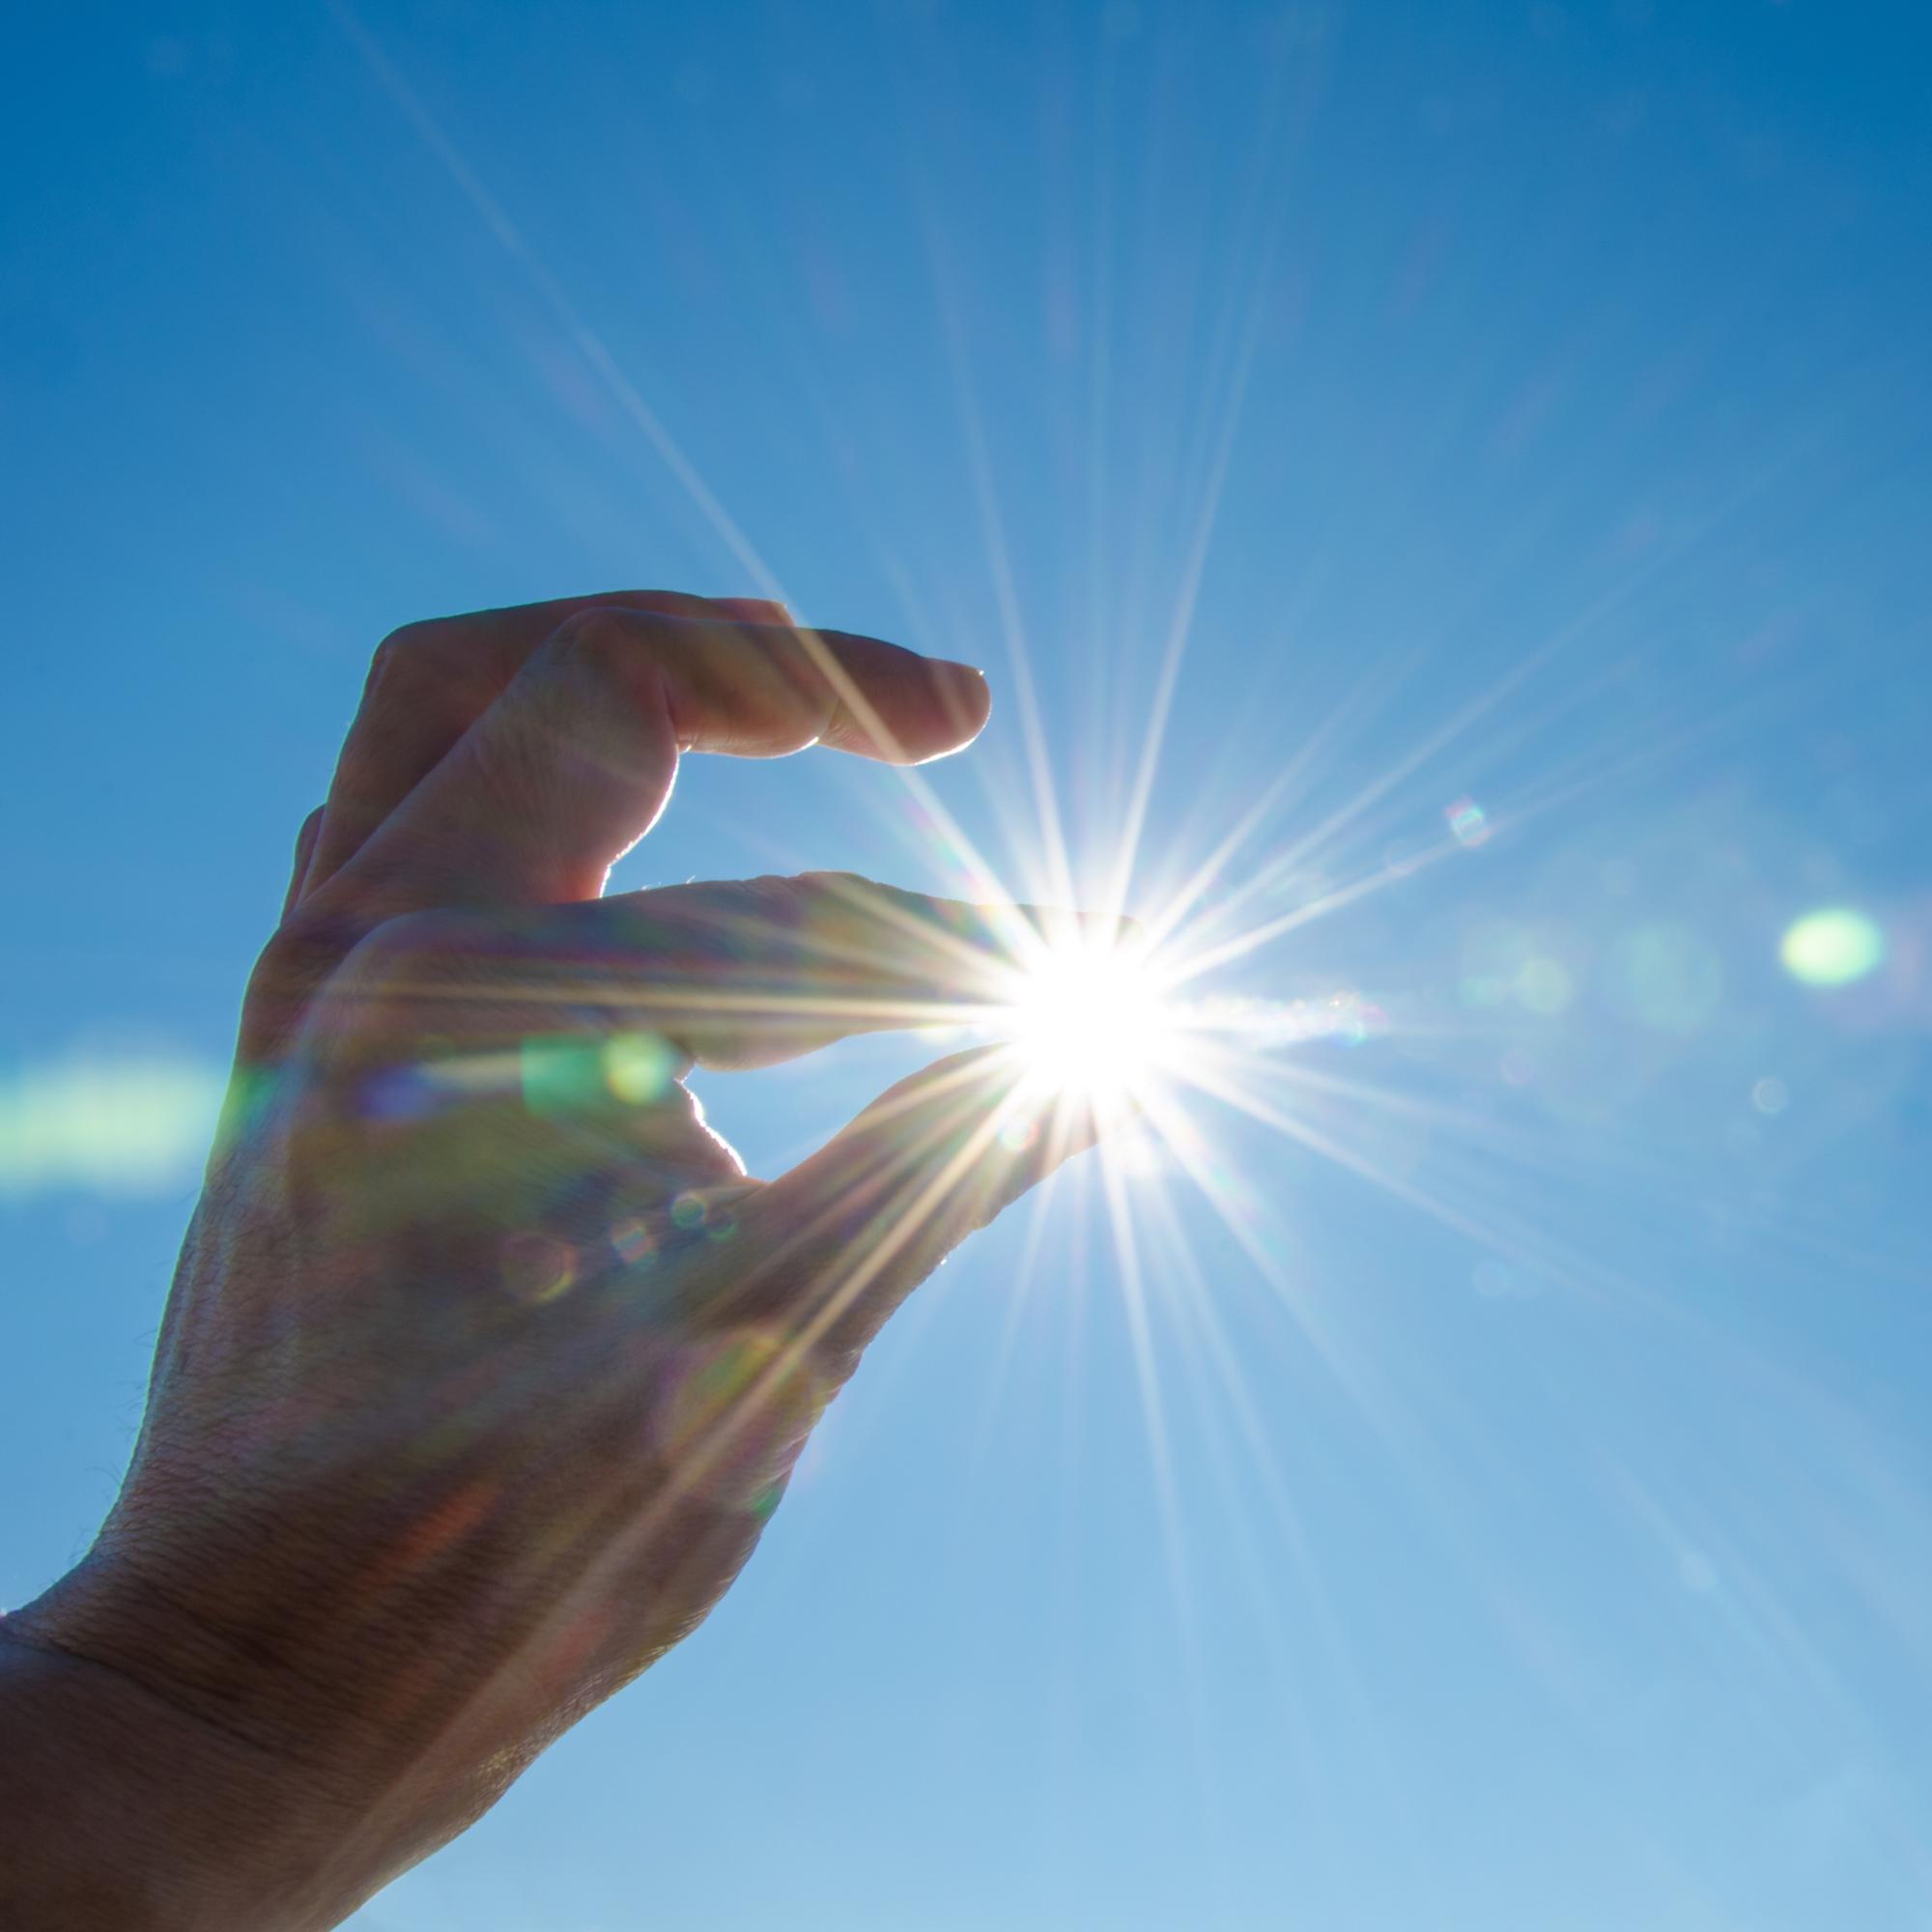 Sunshine Changing the World